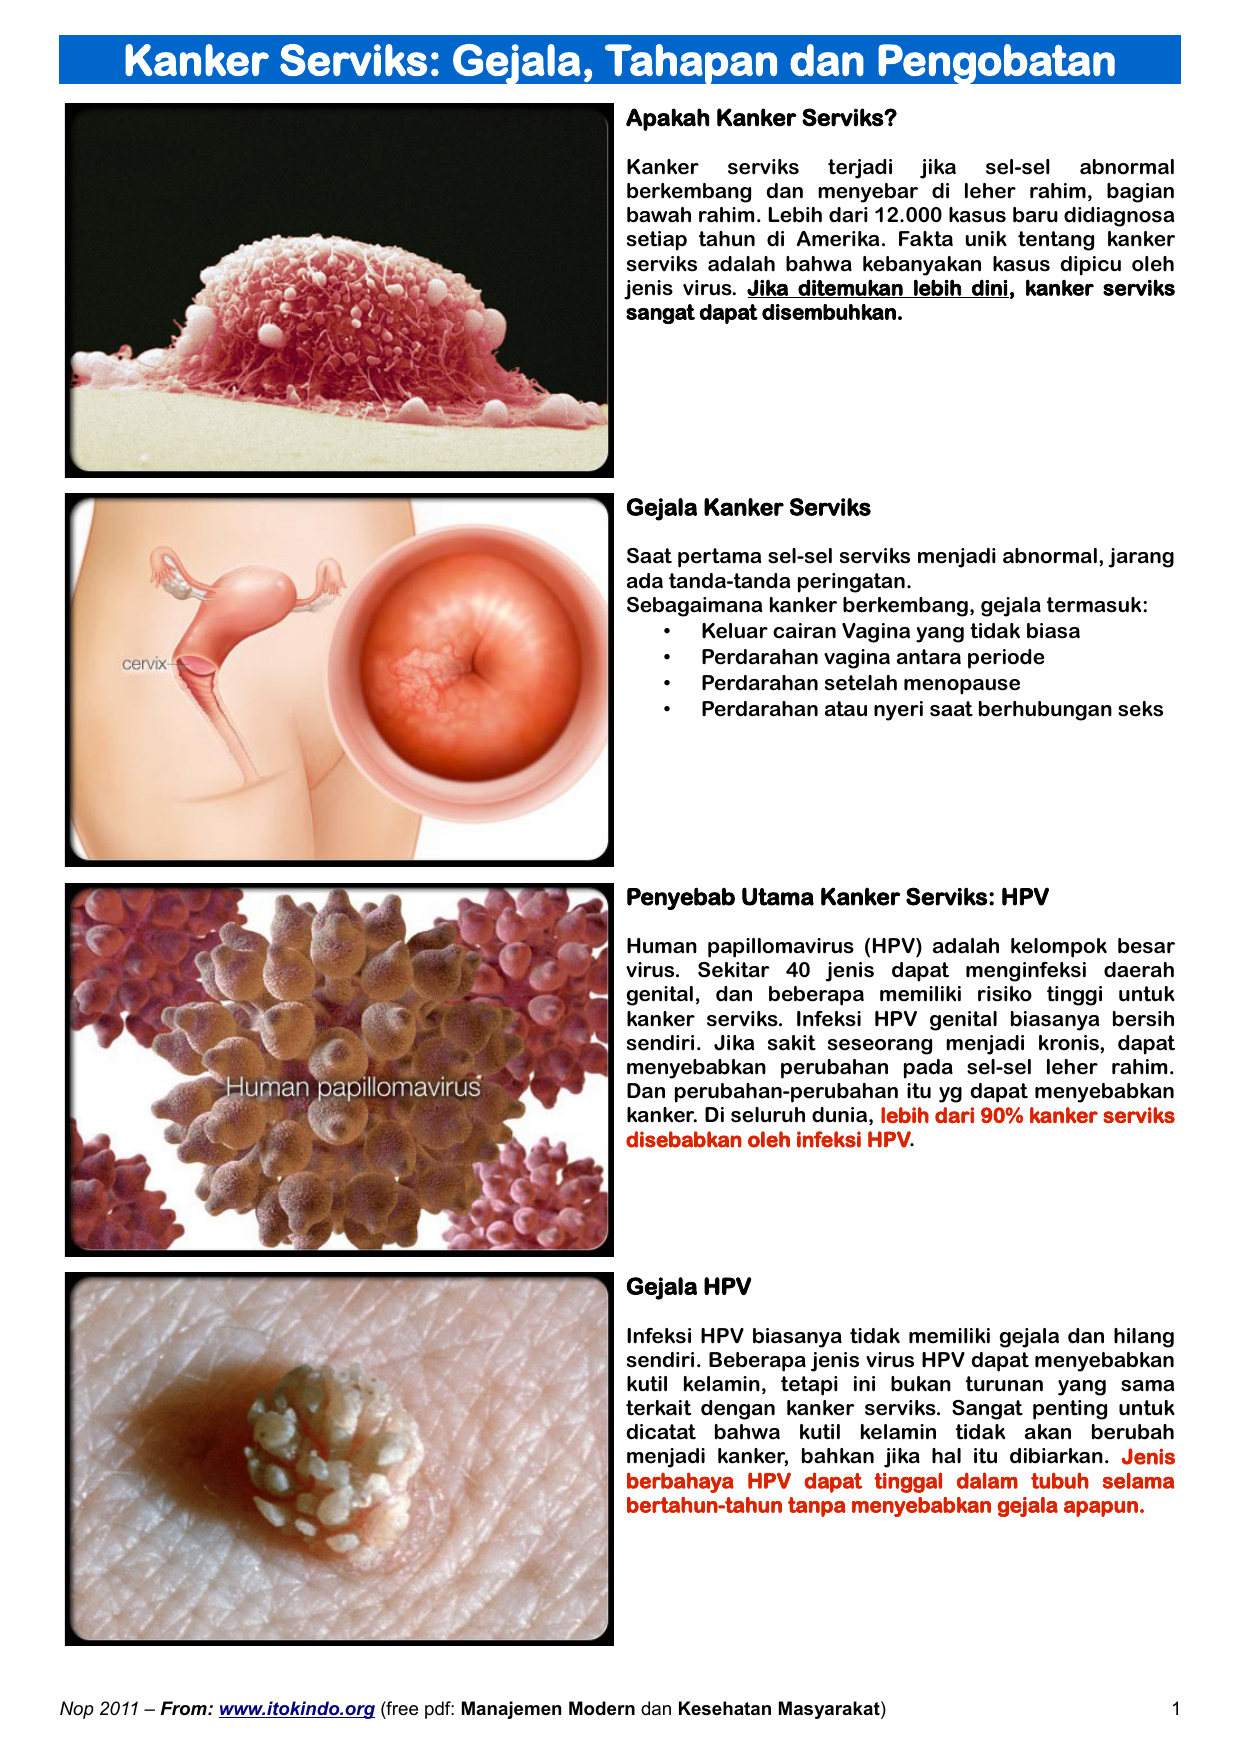 human papilloma virus menyebabkan)